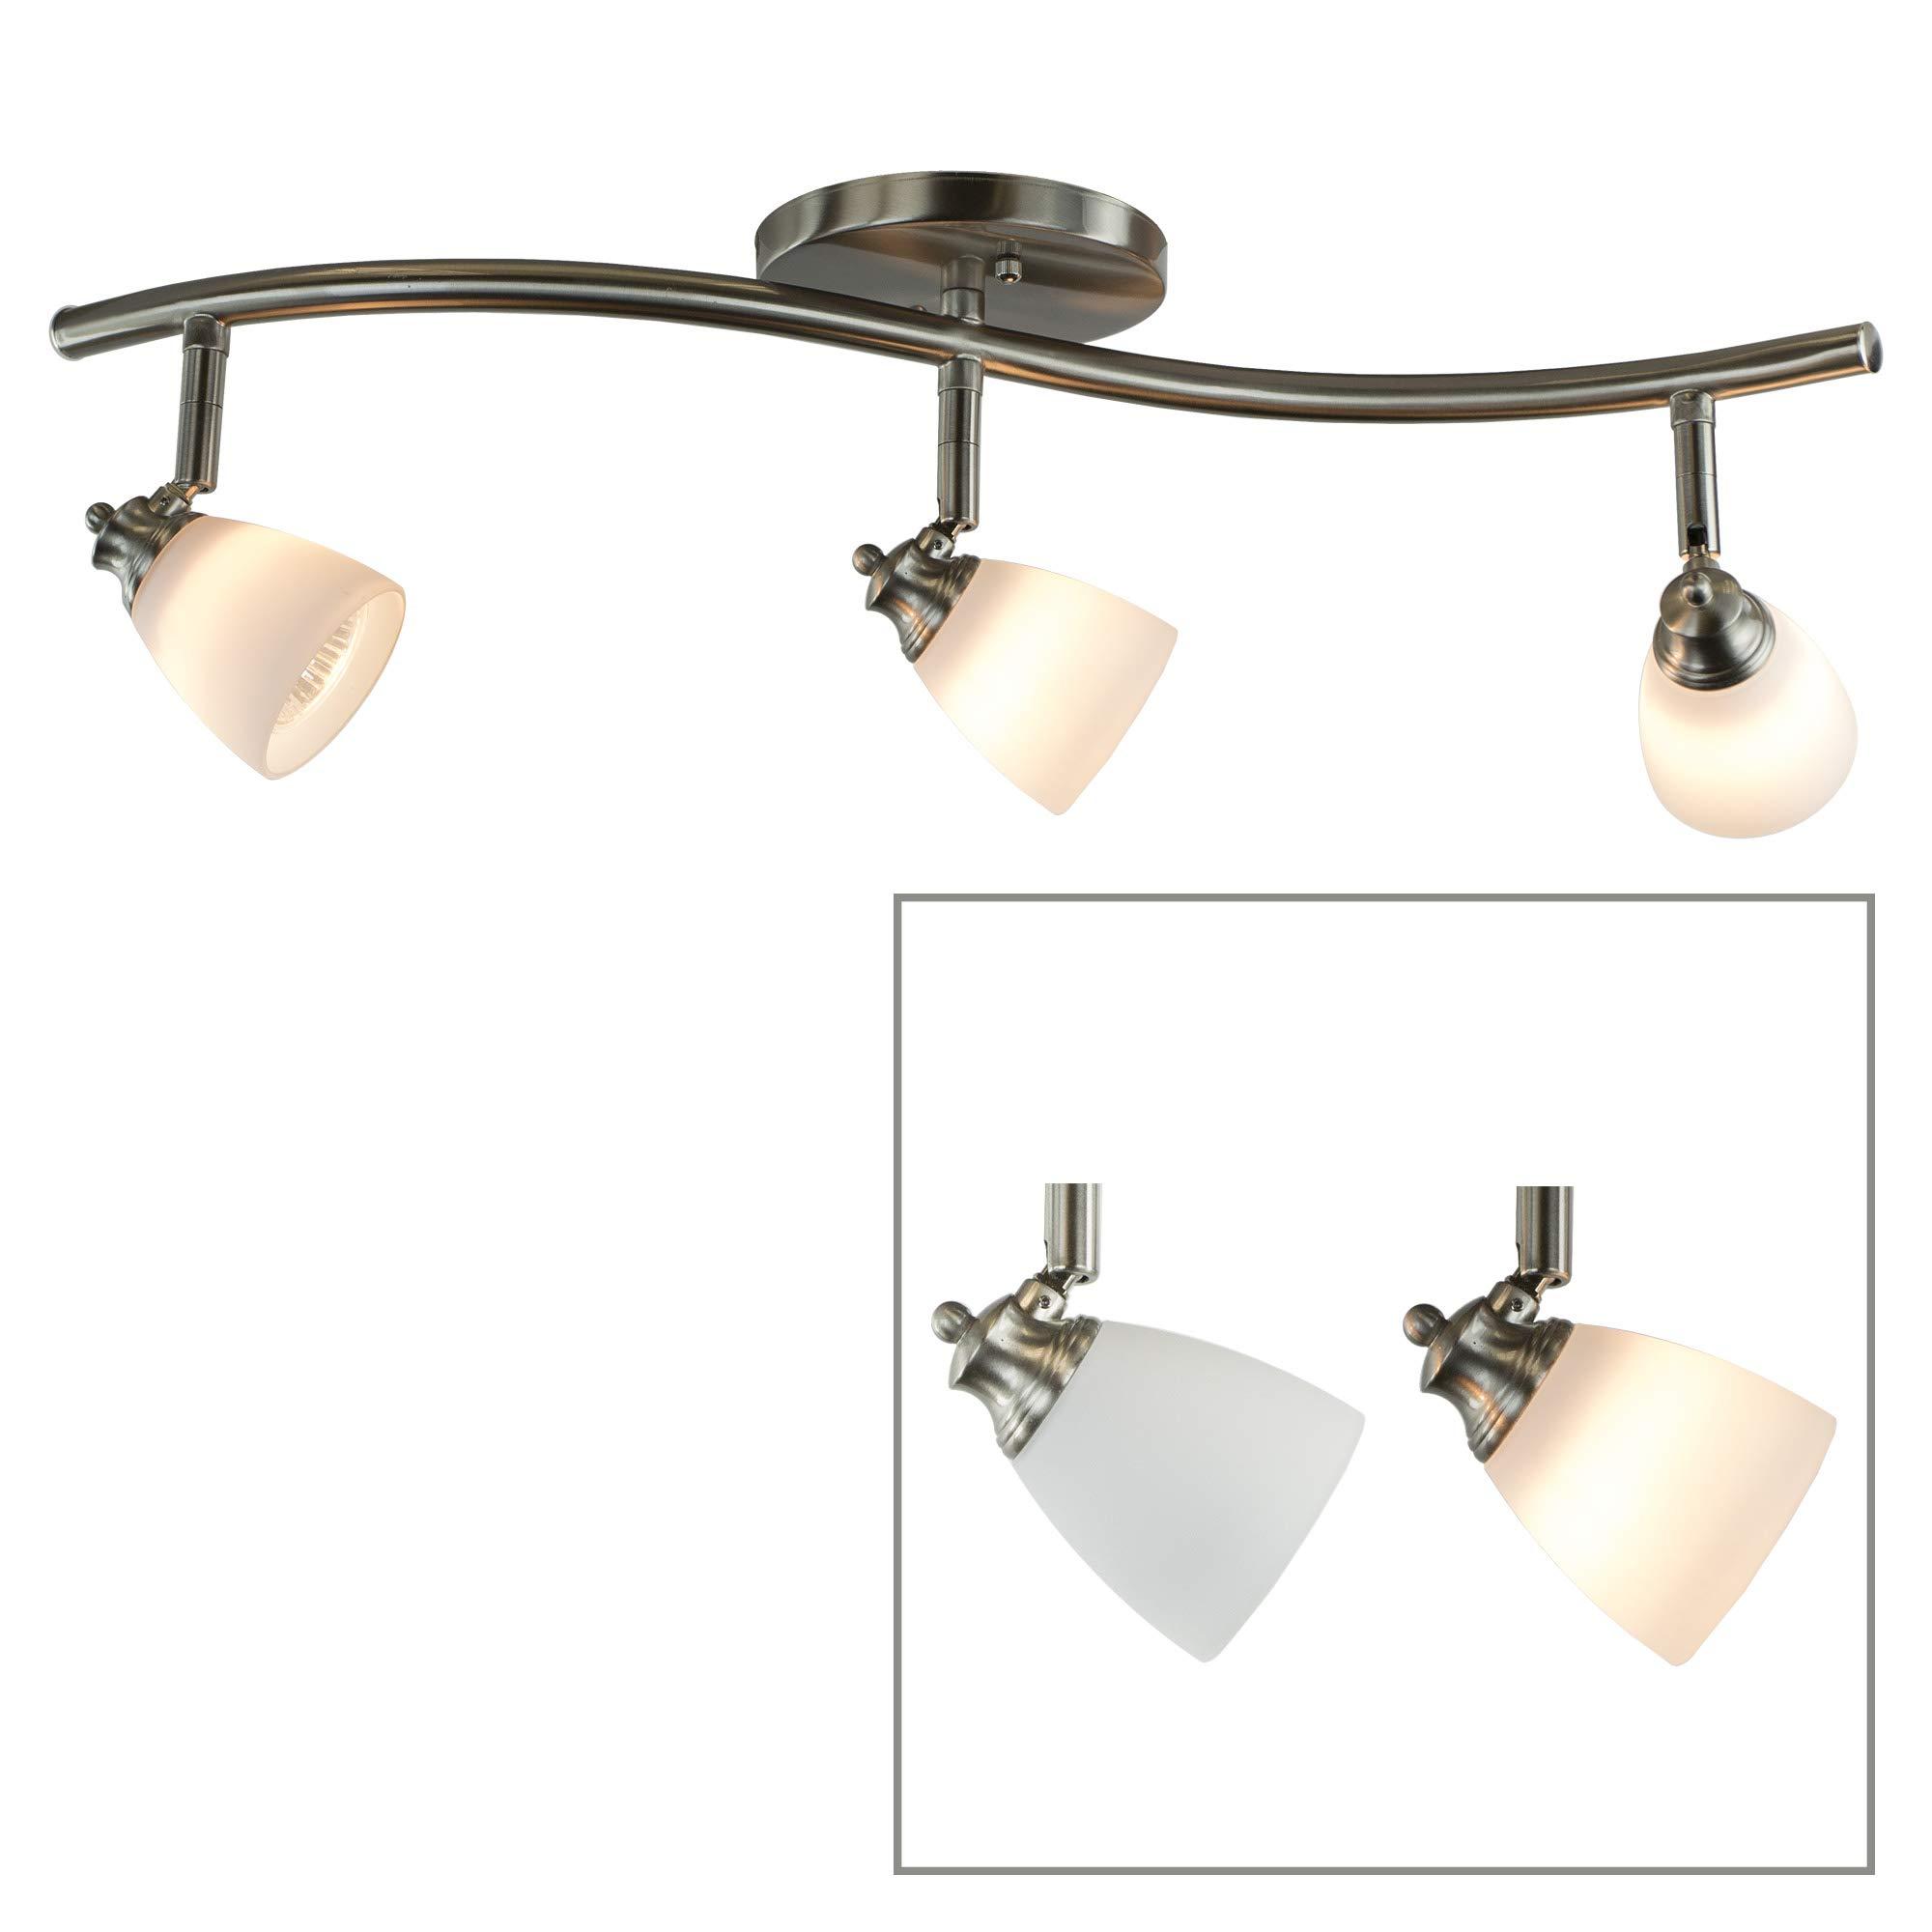 Direct-Lighting 3 Lights Adjustable Track Lighting Kit - Dark Bronze Finish - White Glass Track Heads - GU10 Bulbs Included. D268-23C-DB-WH